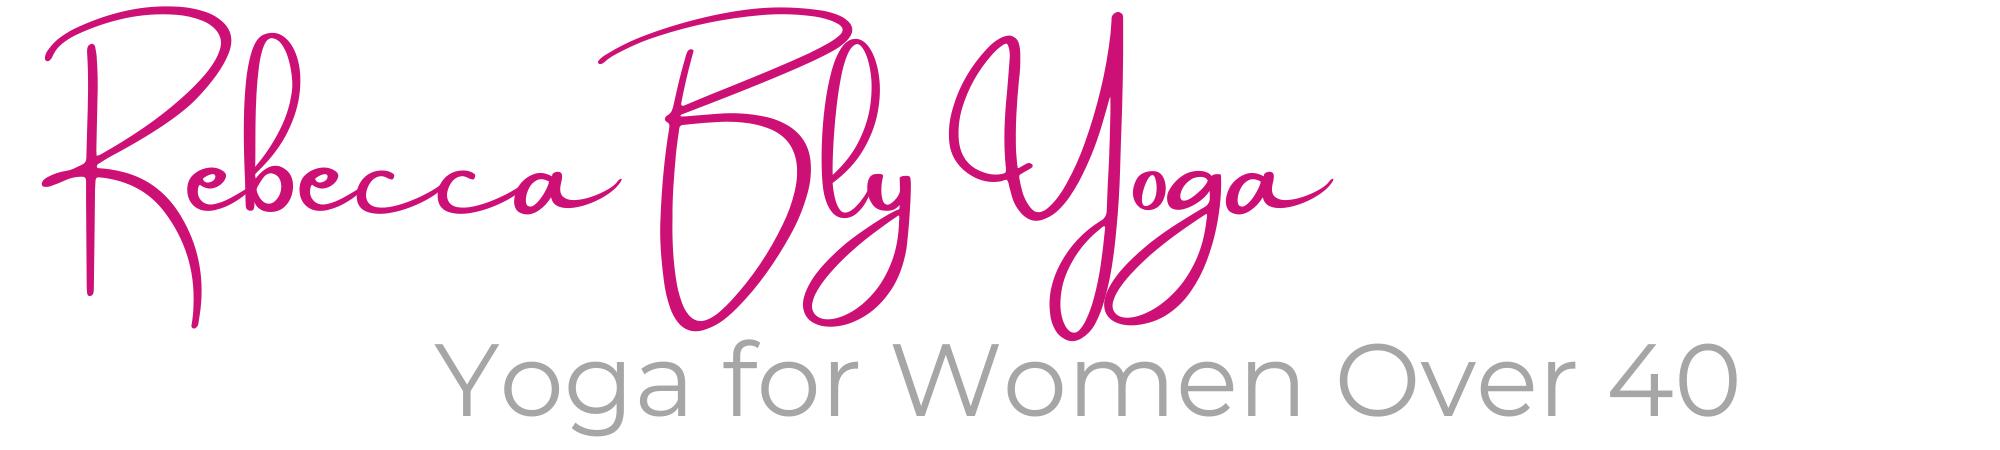 Rebecca Bly Yoga